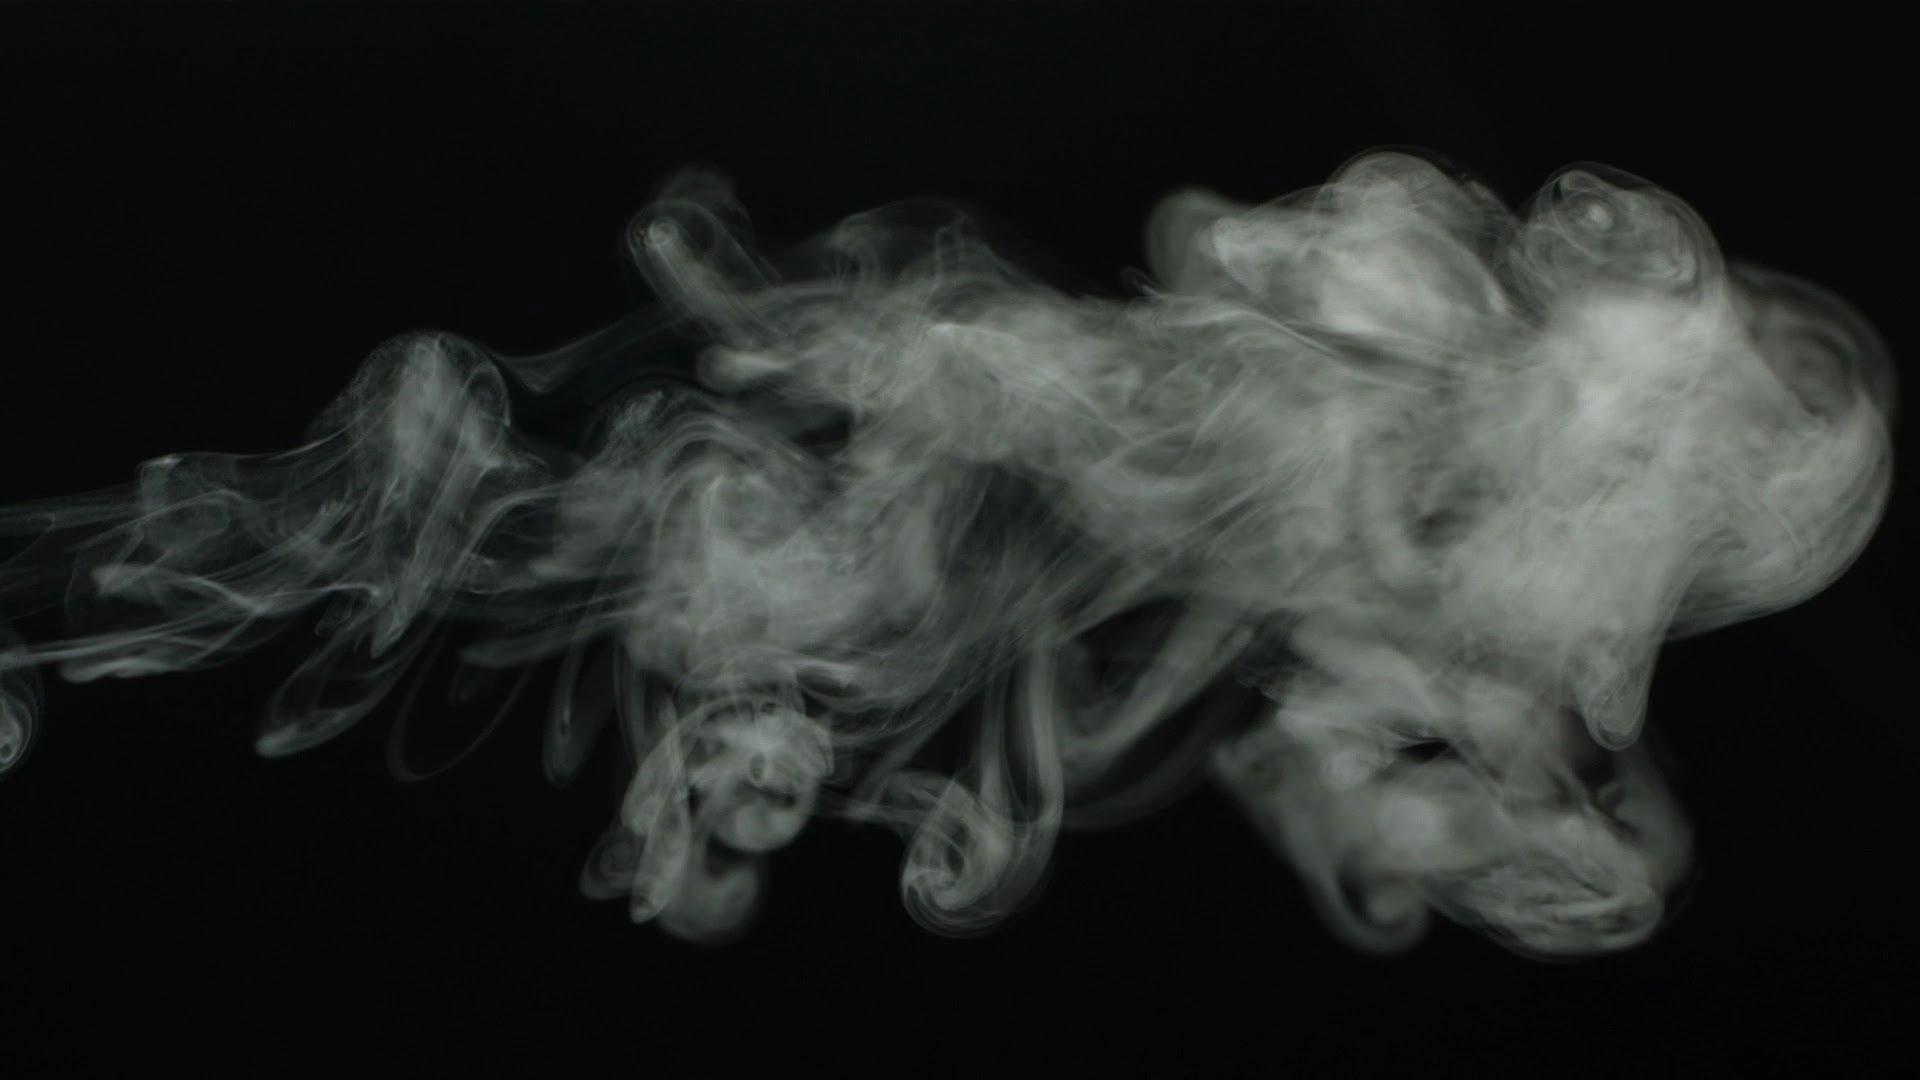 Quel d tecteur de fum e connect choisir smart attacks - Detecteur de fumee qui bip ...